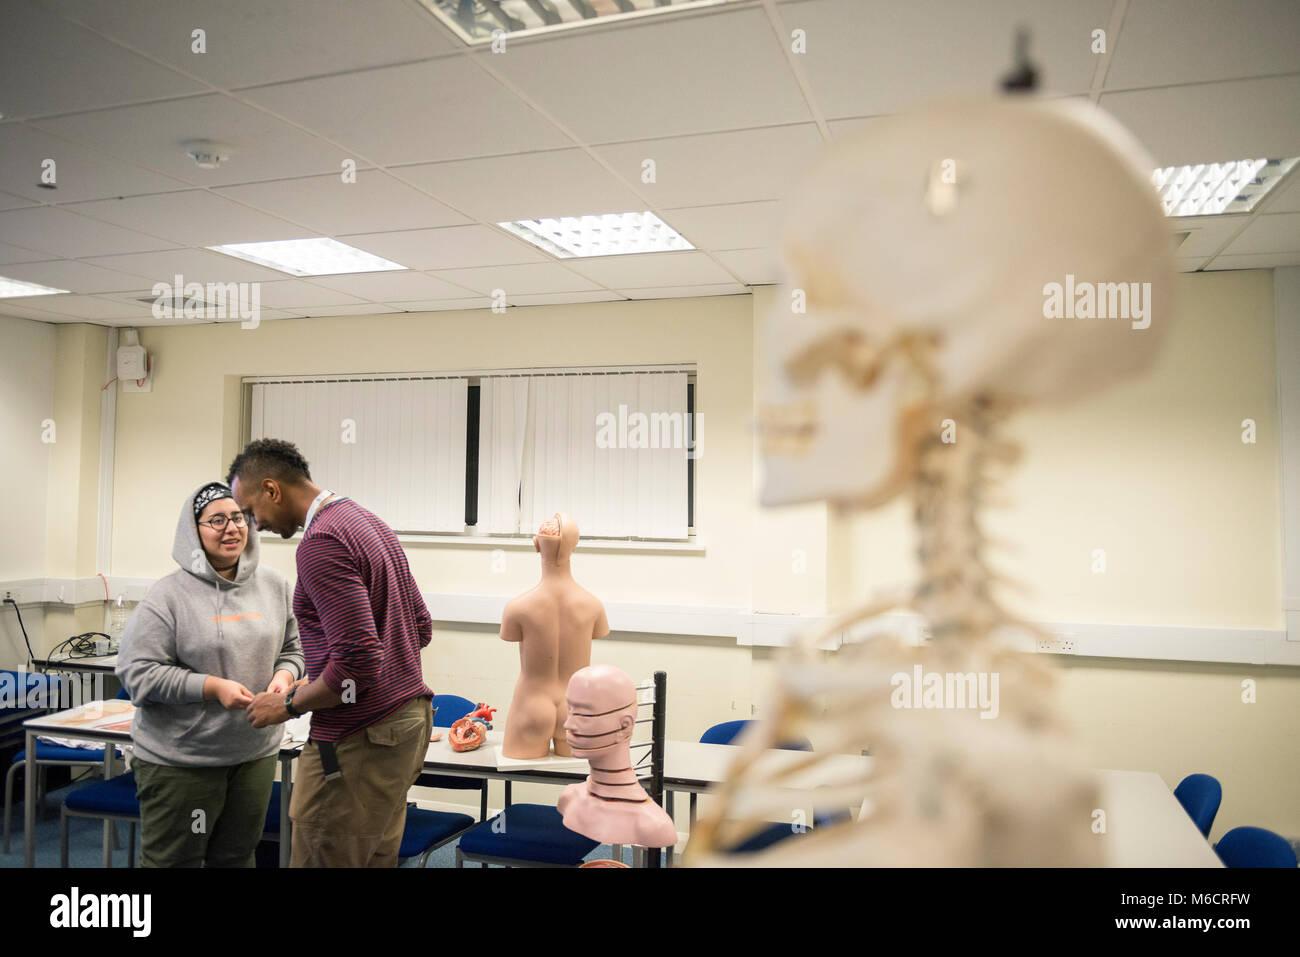 Anatomy Lesson University Stockfotos & Anatomy Lesson University ...